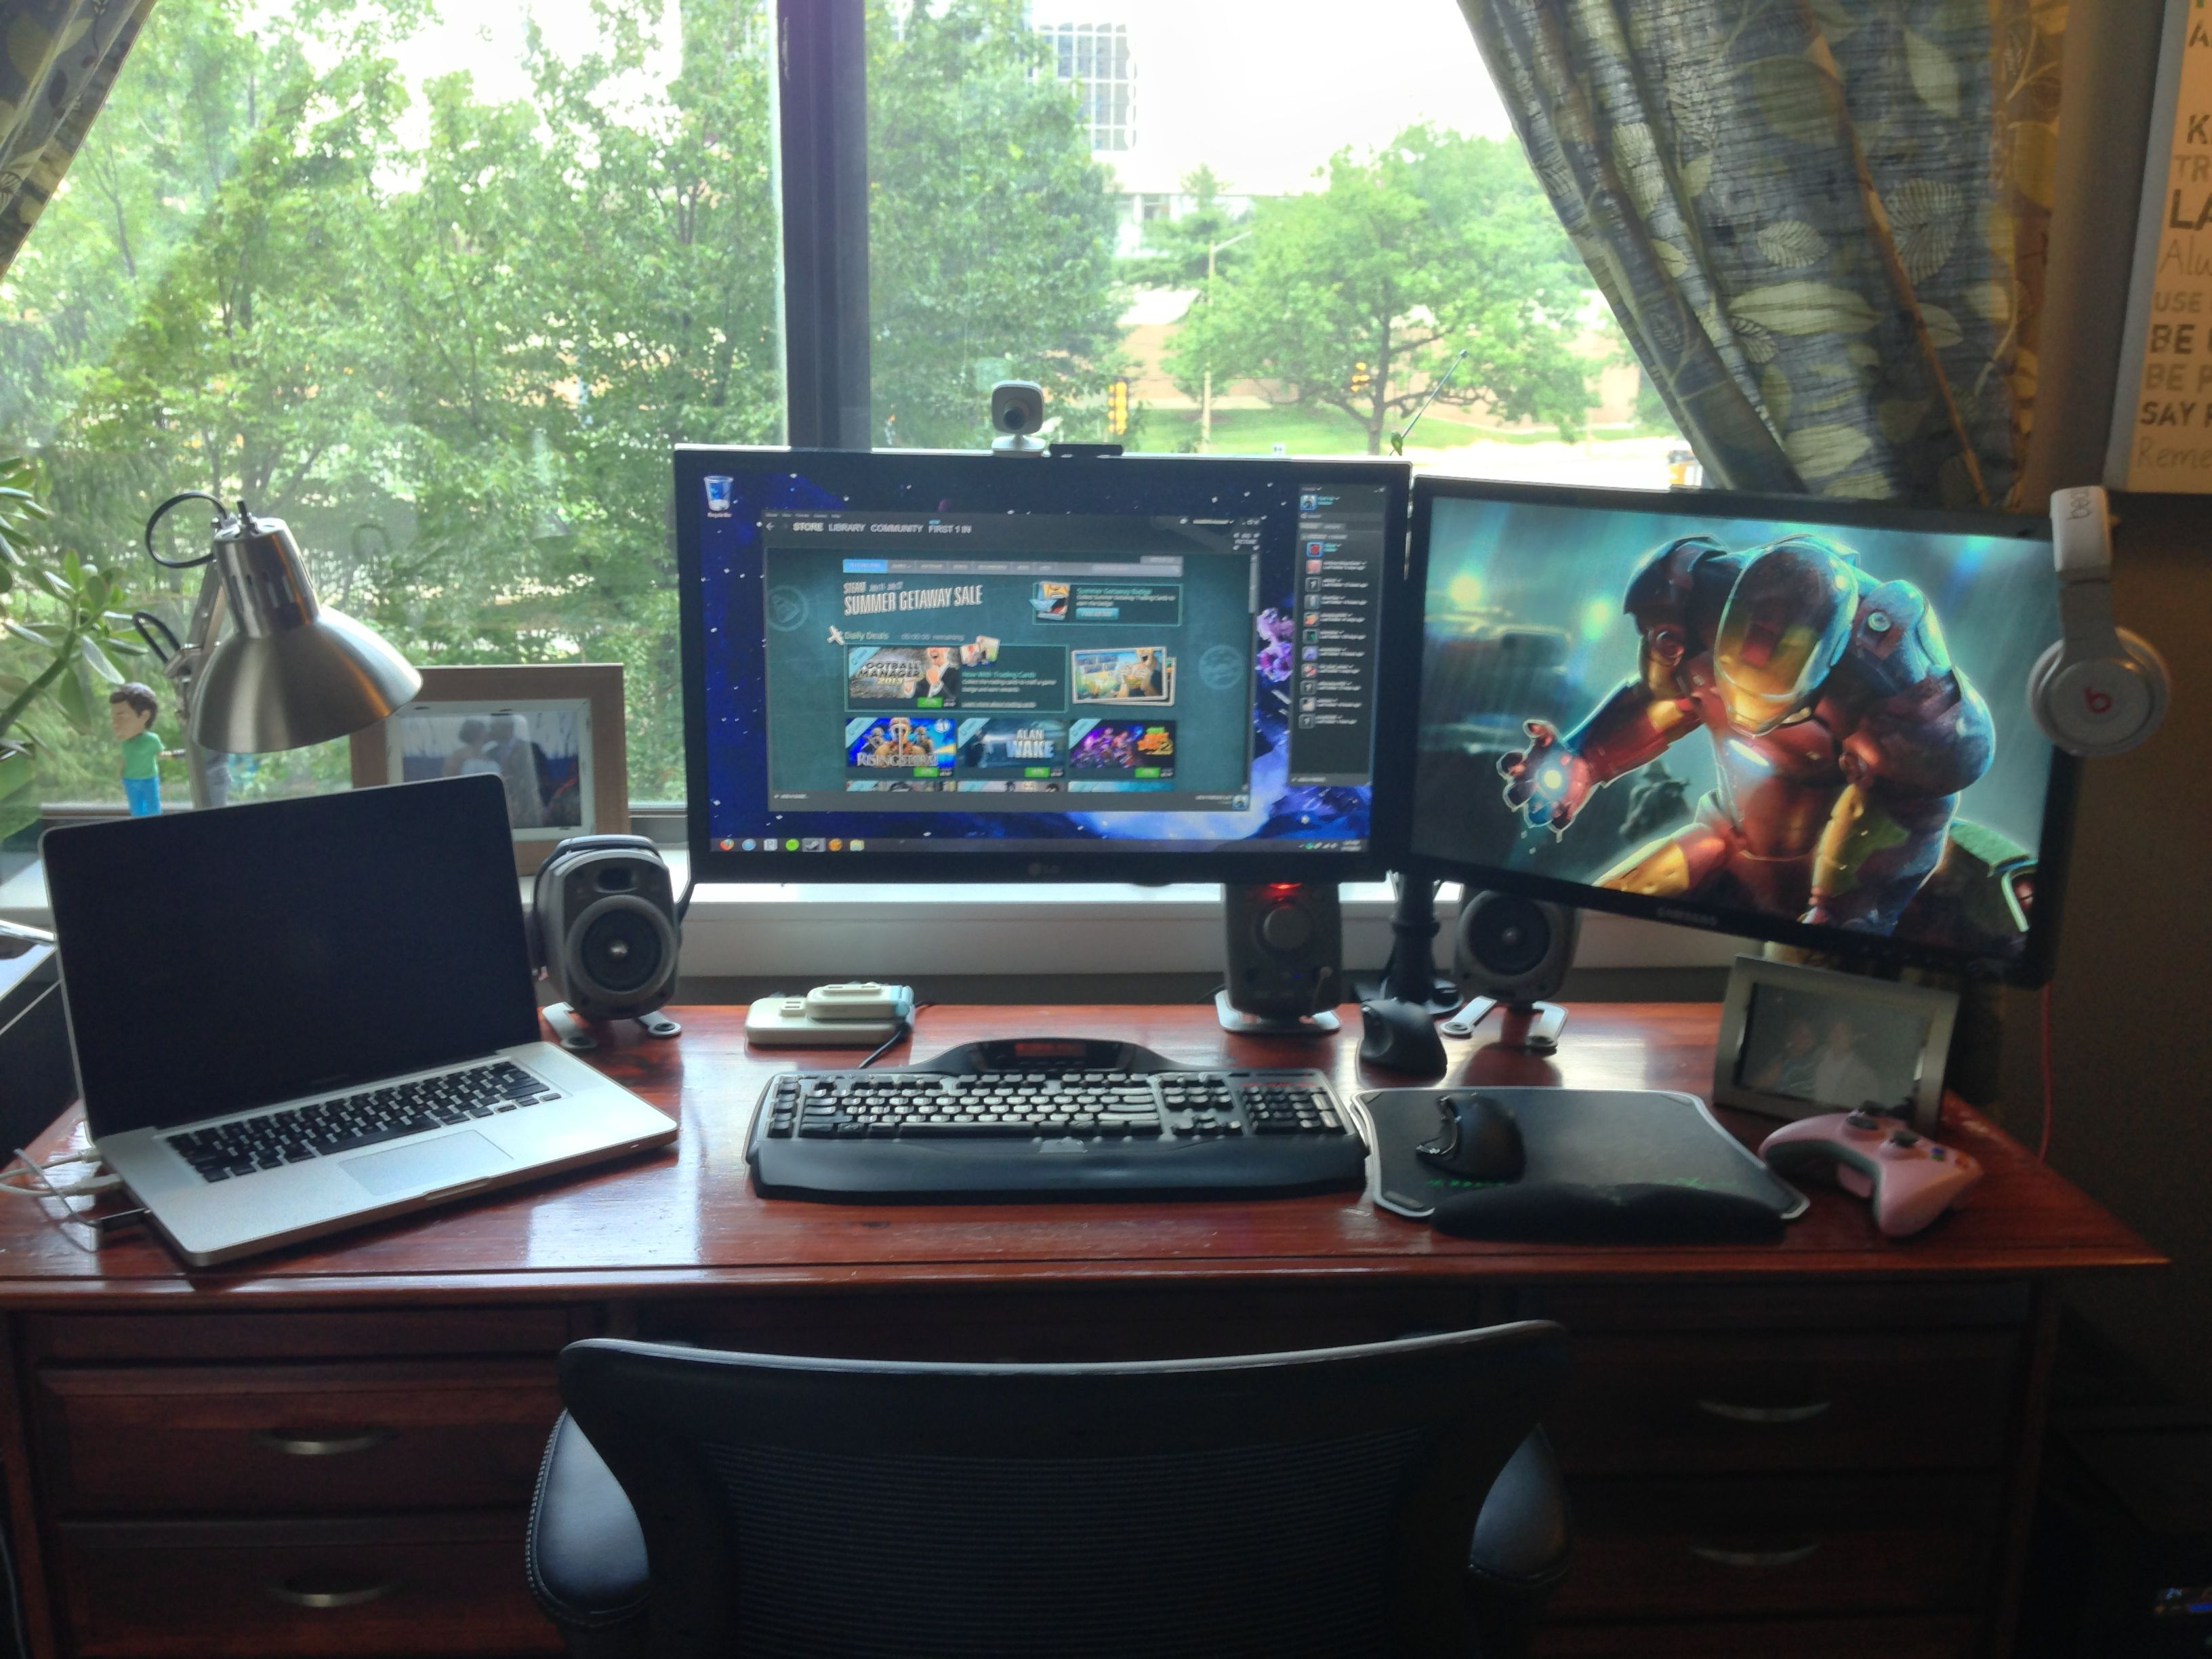 Home Office Dual Desk Setup: Revised Setup Using A Dual Monitor Stand To Regain Desktop